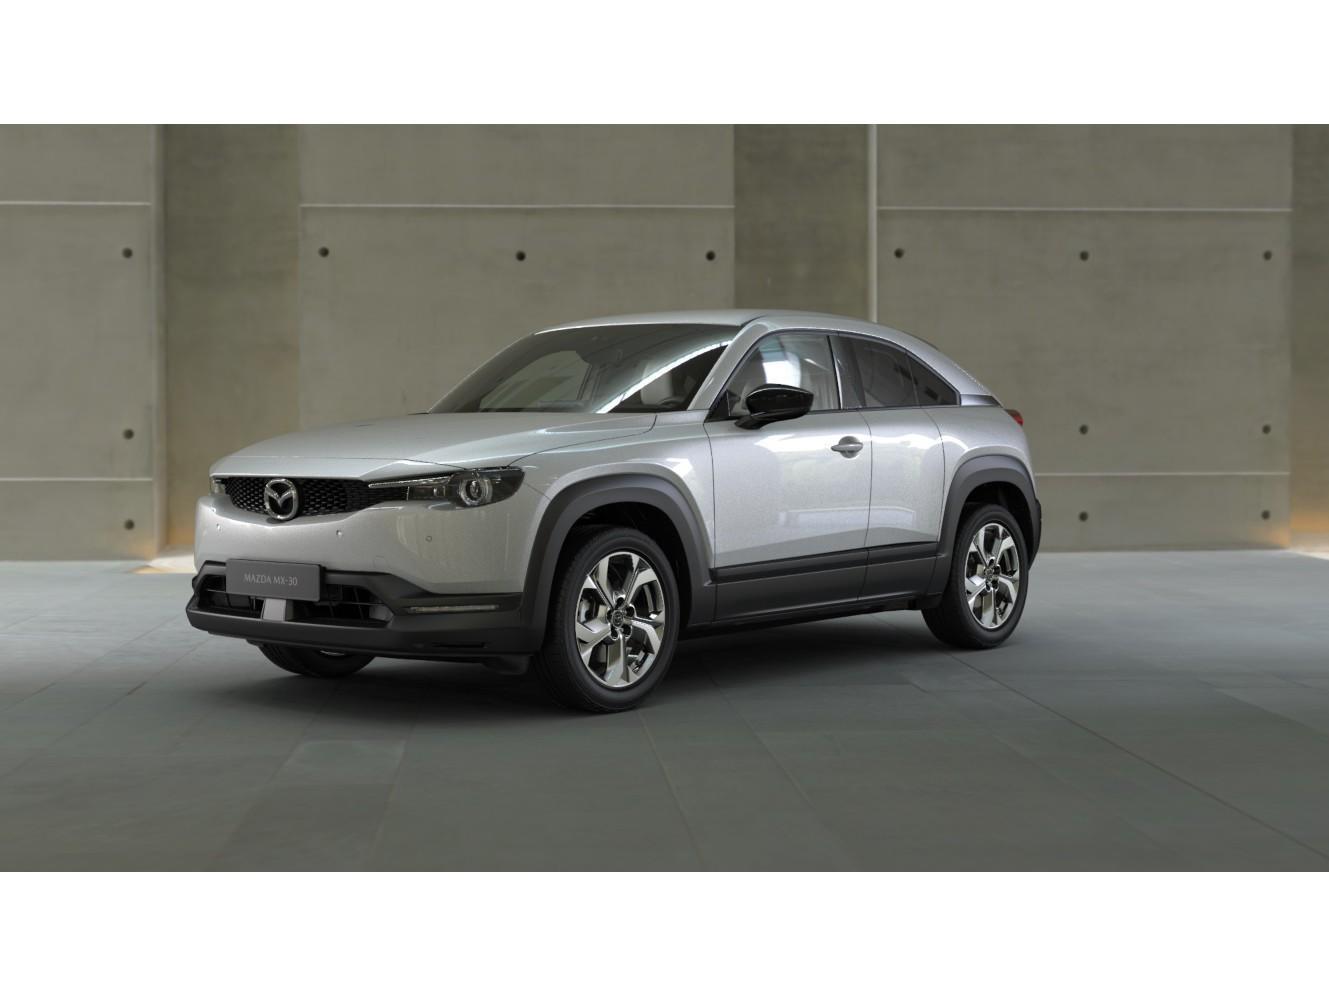 Mazda Mx-30 E-skyactiv first edition nu te bestellen!